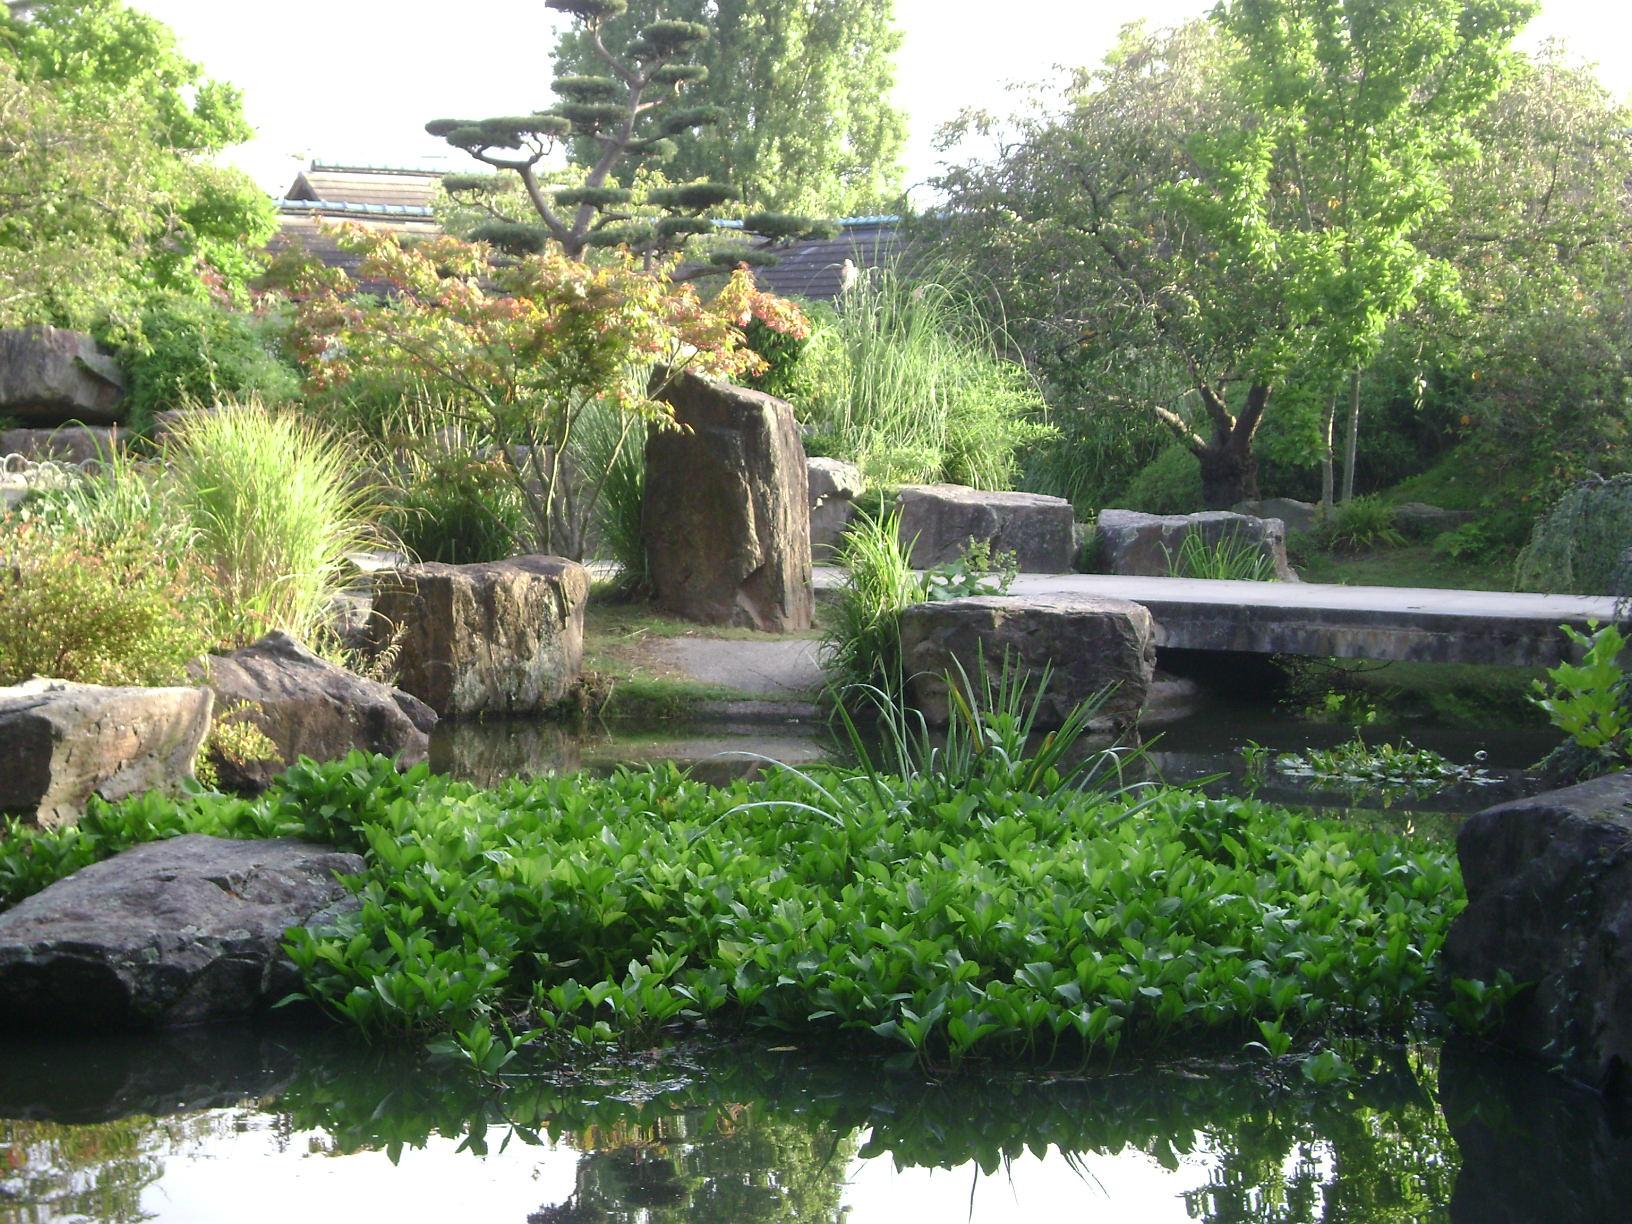 France: A Japanese Zen Garden On An Island In Nantes | Globetrotting  Gardener